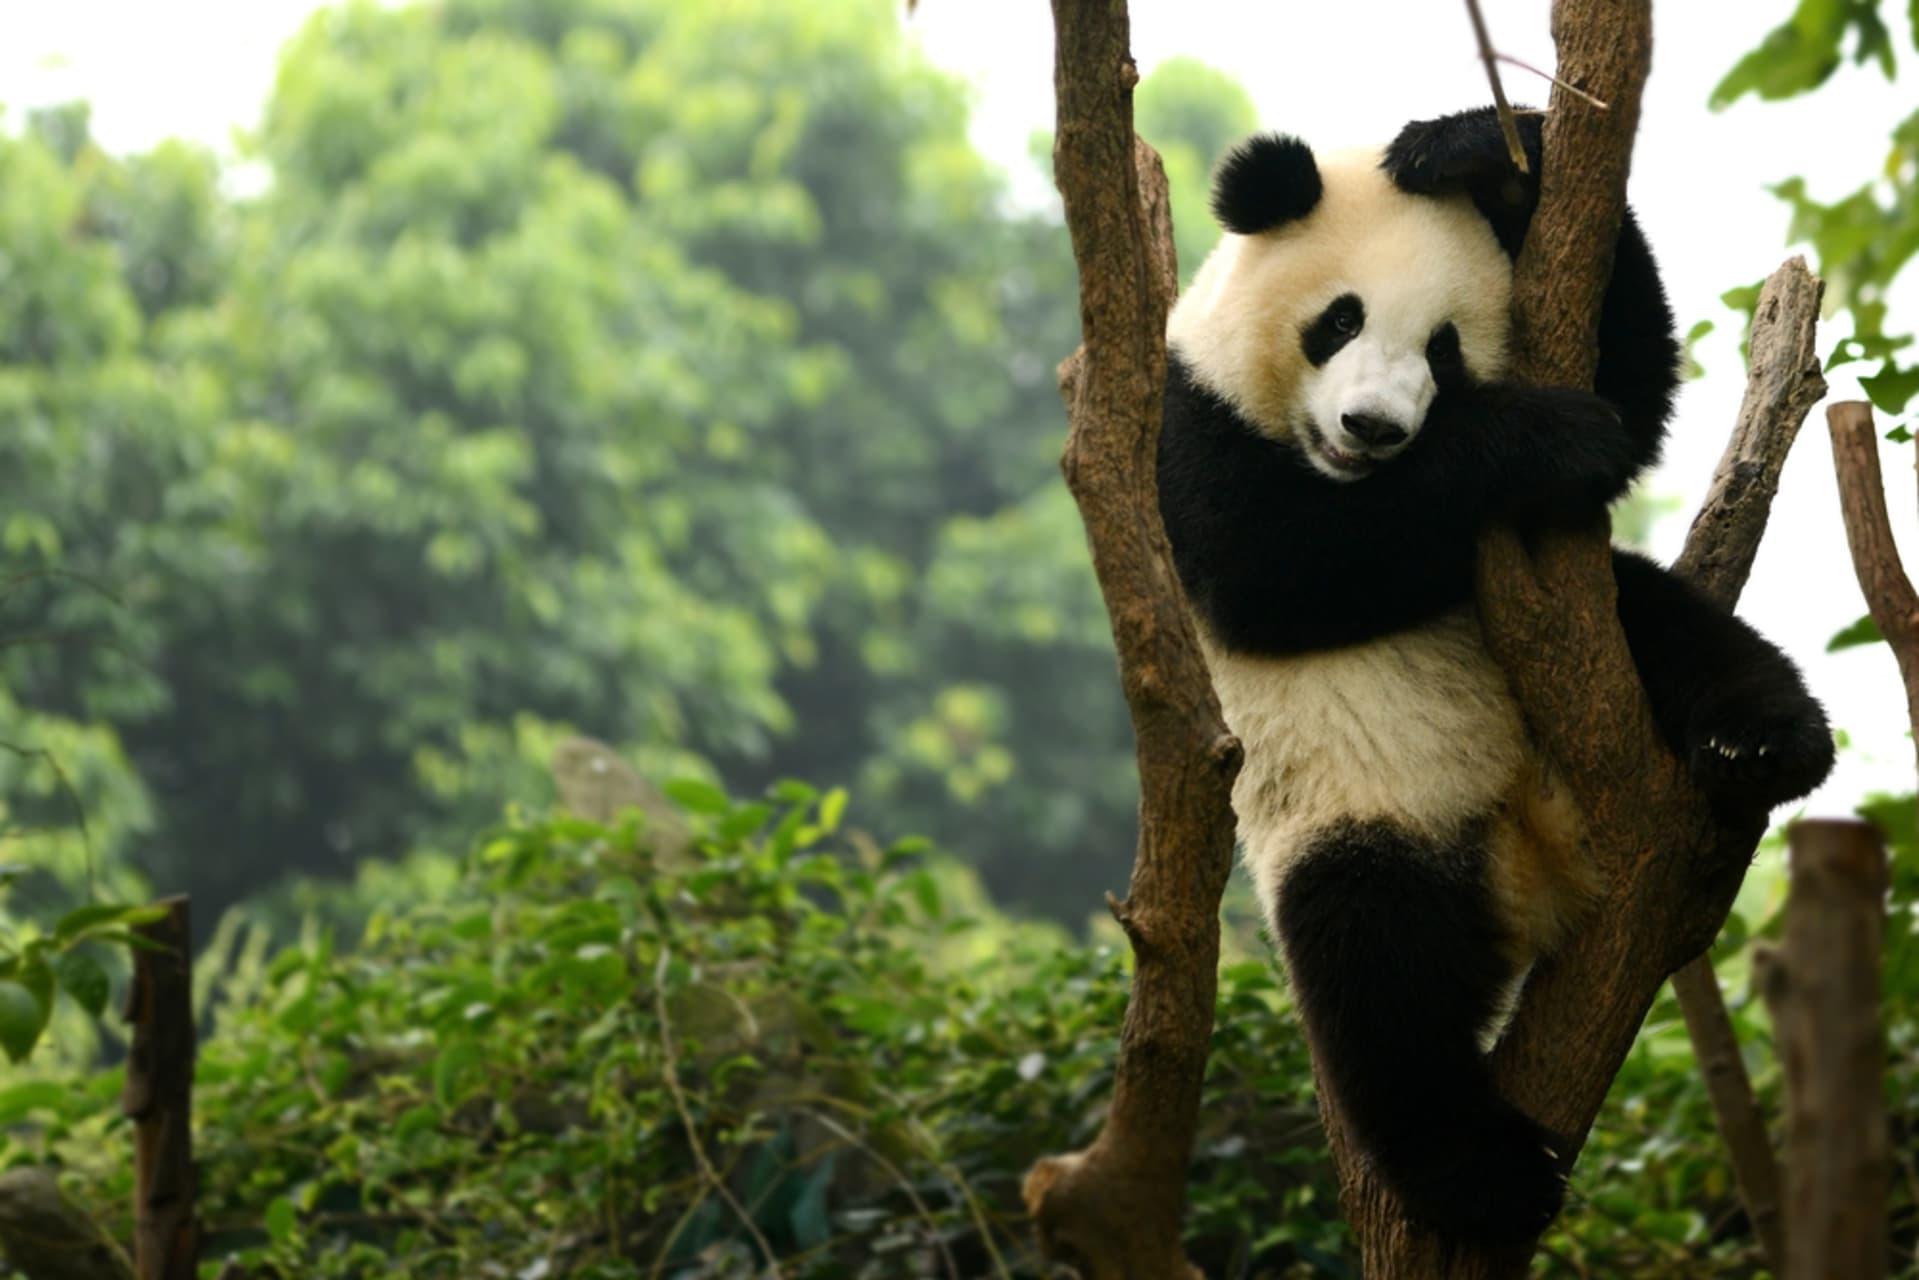 Chengdu - Chengdu Giant Pandas: Explore China's Cutest Attraction